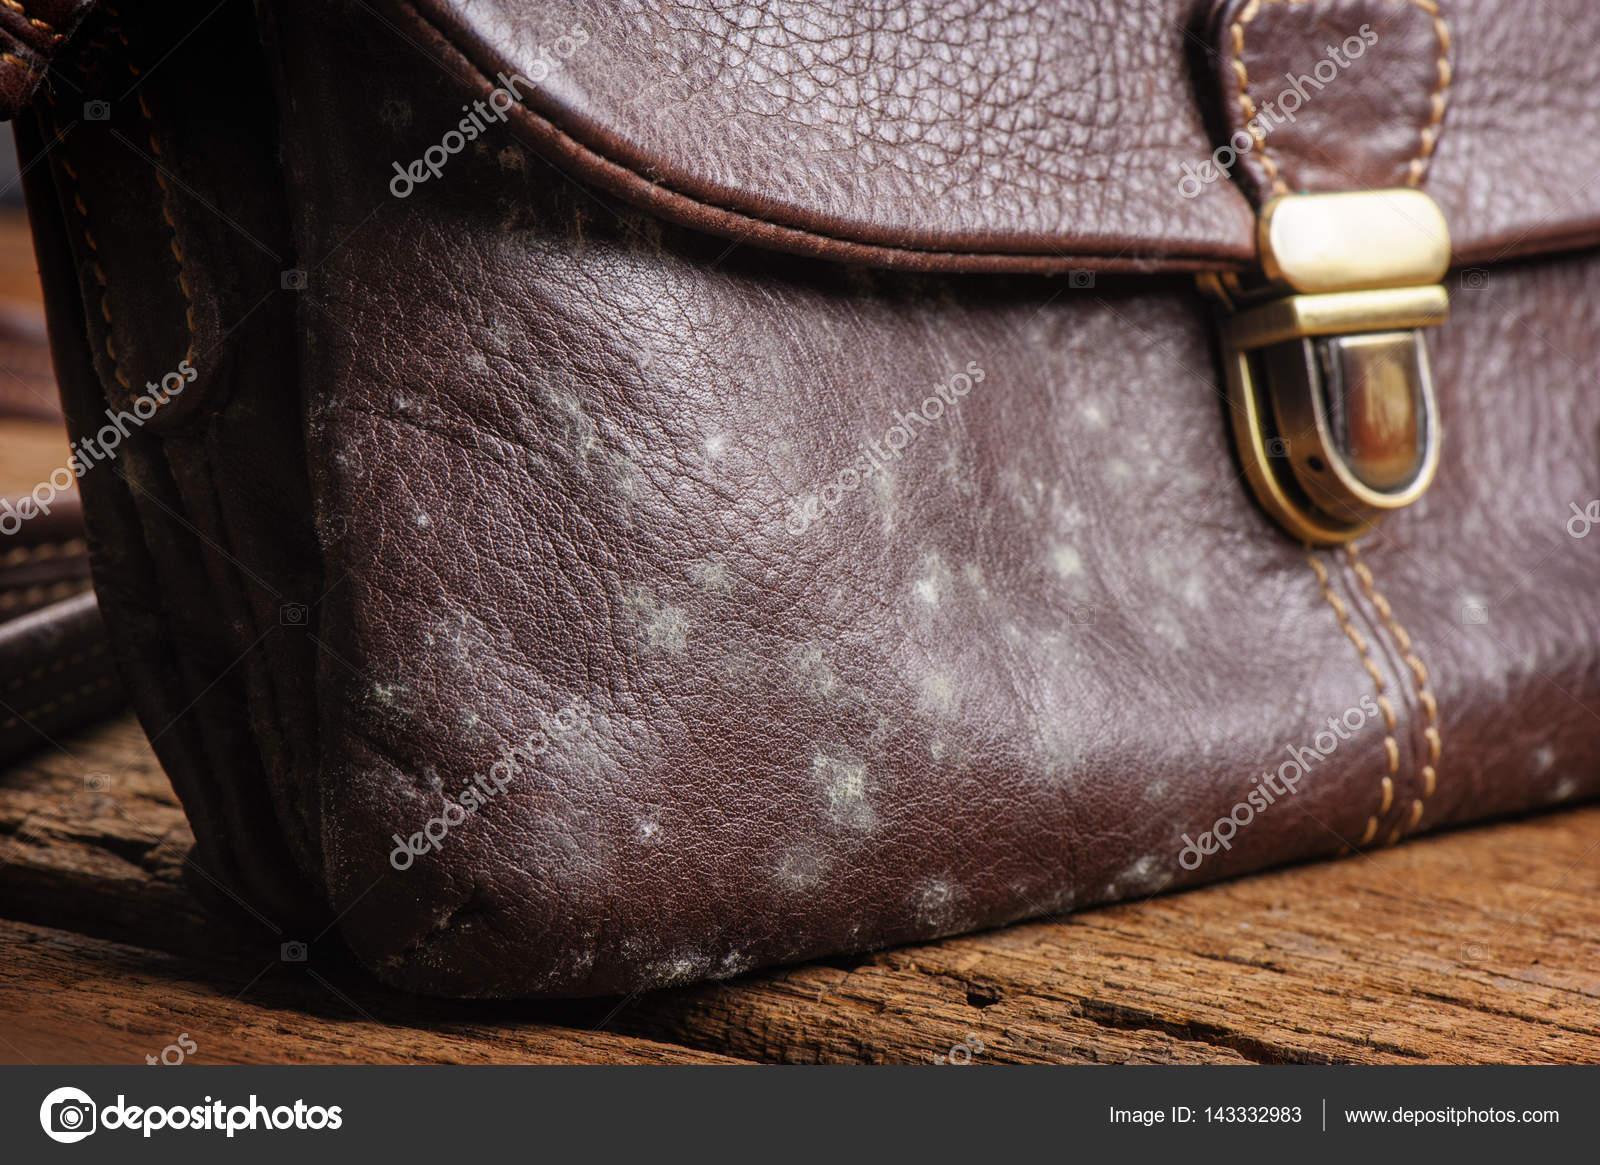 Bekannt Schimmel an Tasche — Stockfoto © norgallery #143332983 CE22